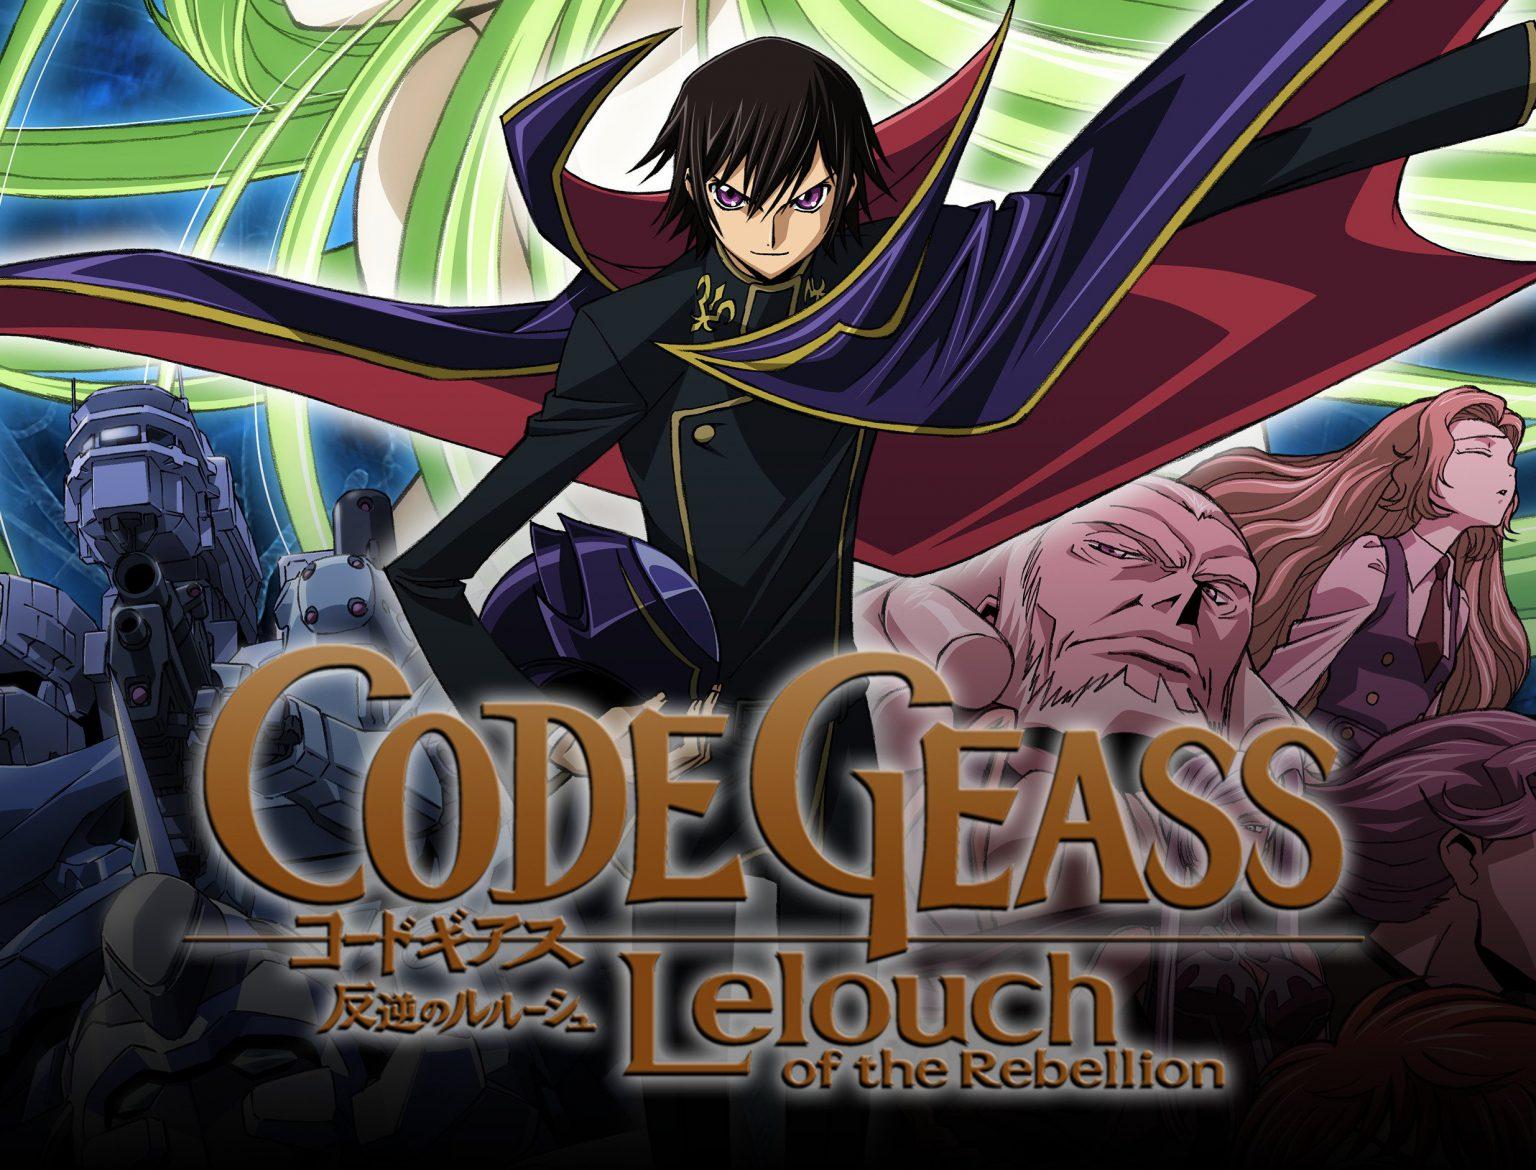 Code Geass Season 3: Release Date, Time [English Dub] Where to Watch